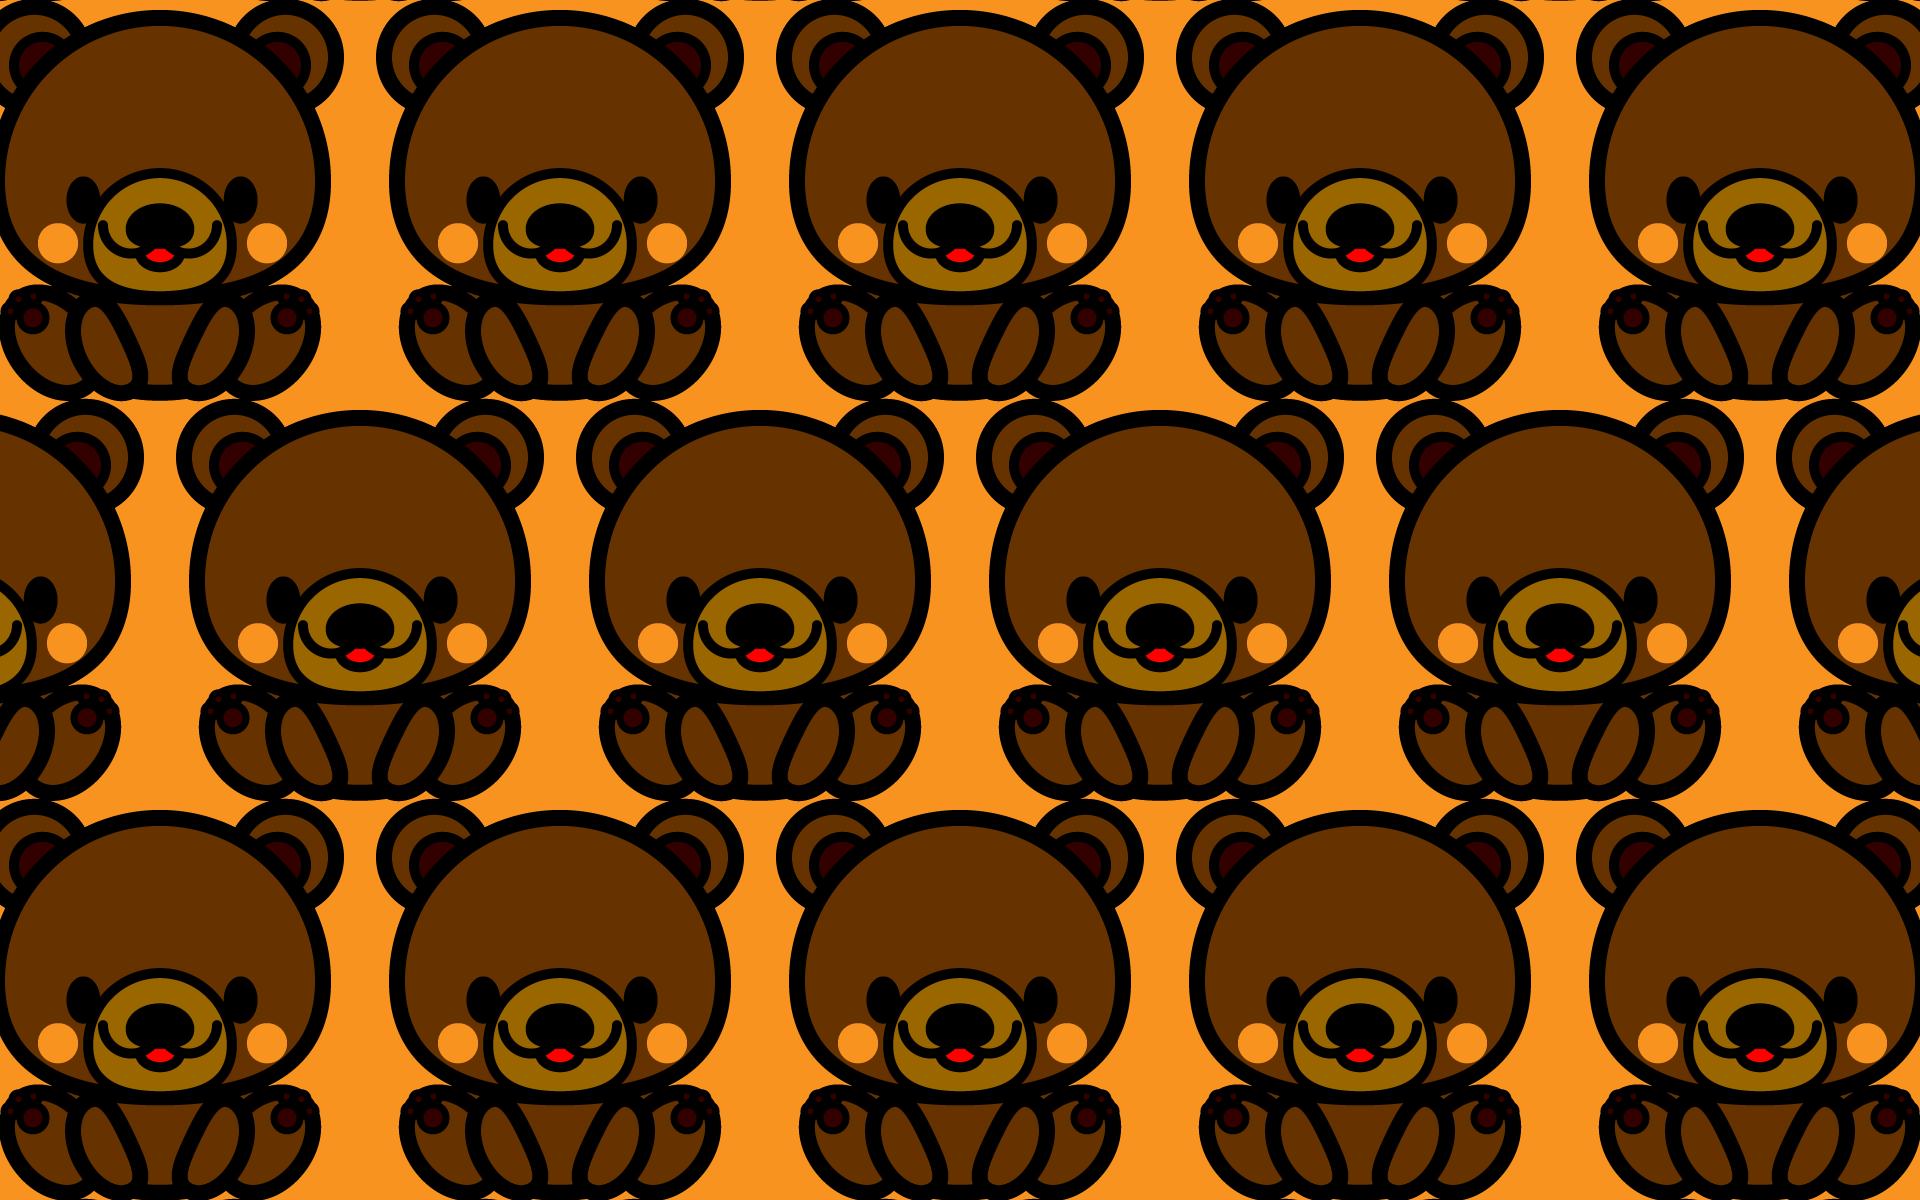 wallpaper3_sitbear-fill-orange-pc